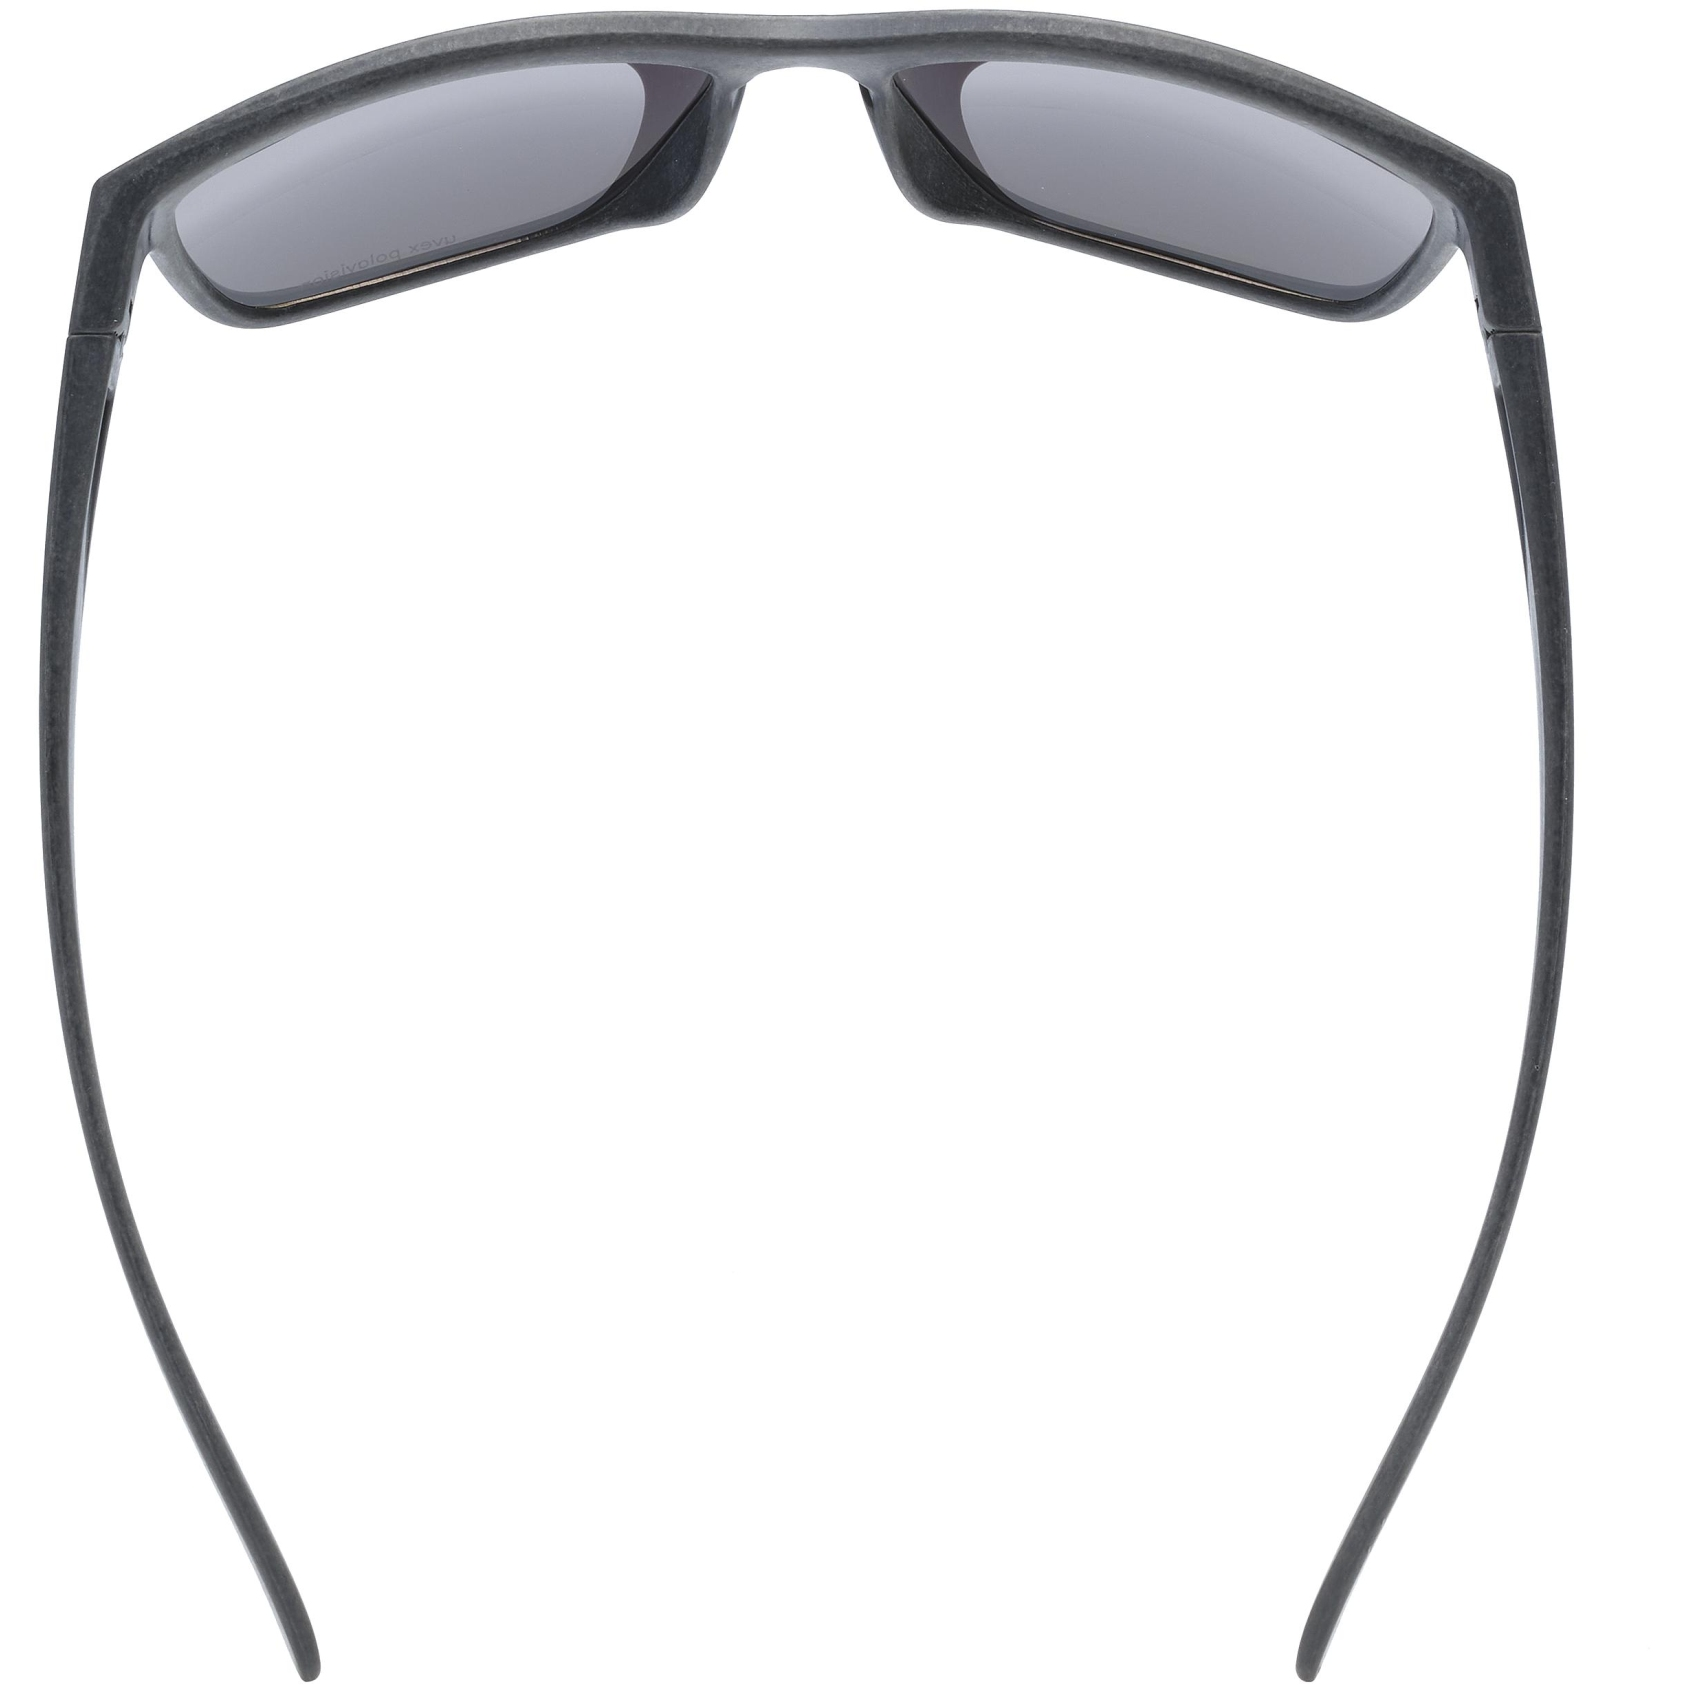 Image of Uvex lgl ocean 2 P Glasses - black mat/polavision mirror blue